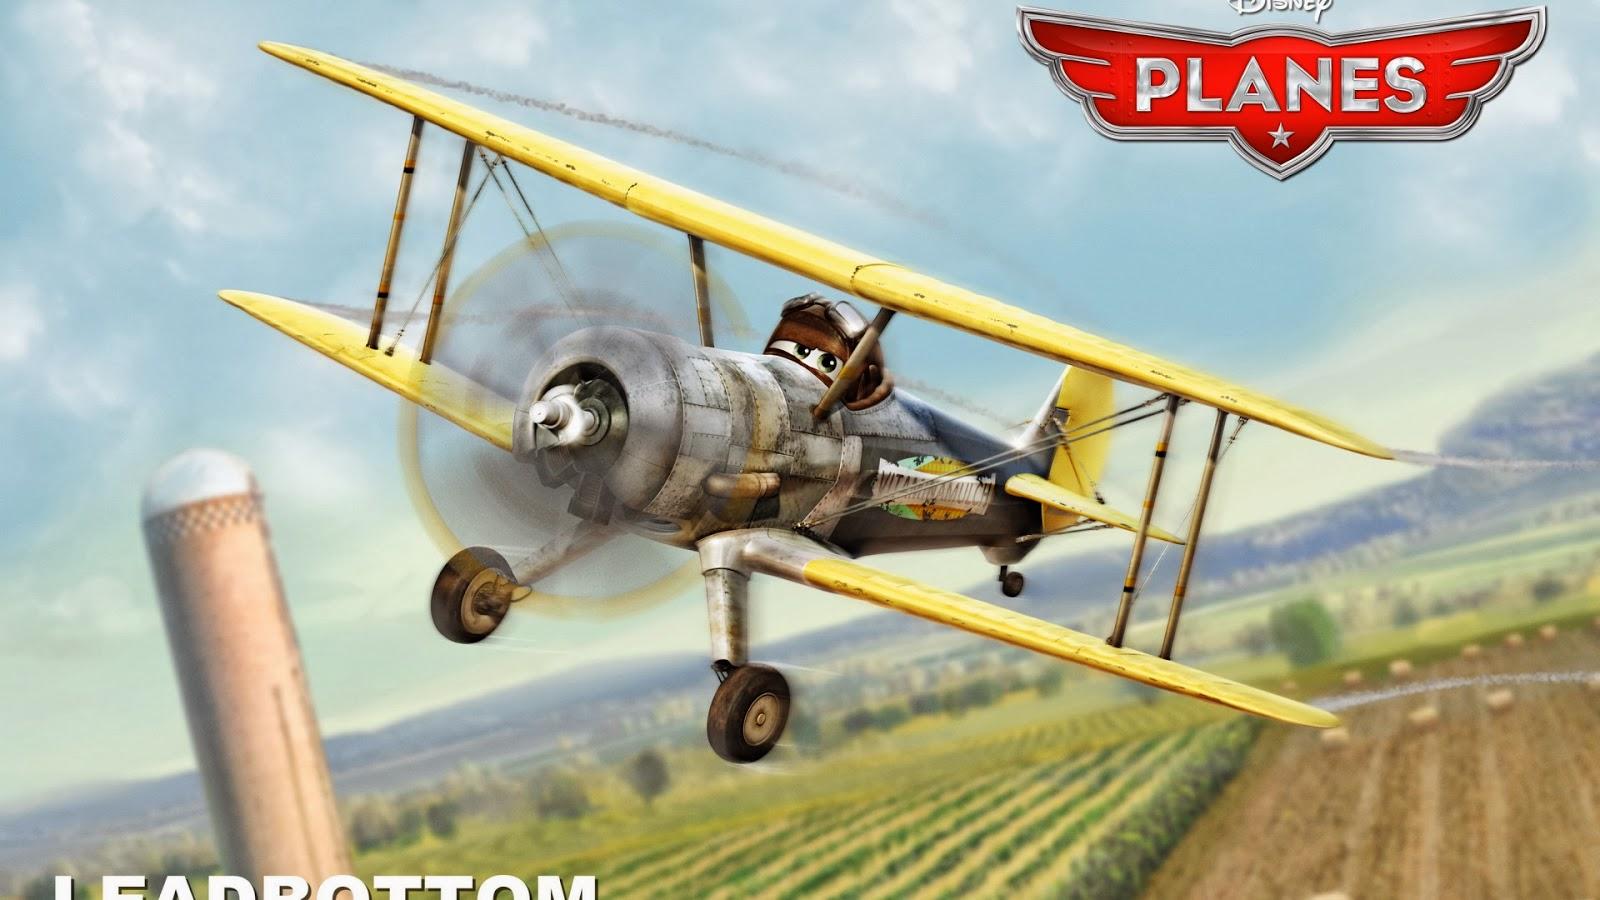 disney planes movie wallpapers - photo #11